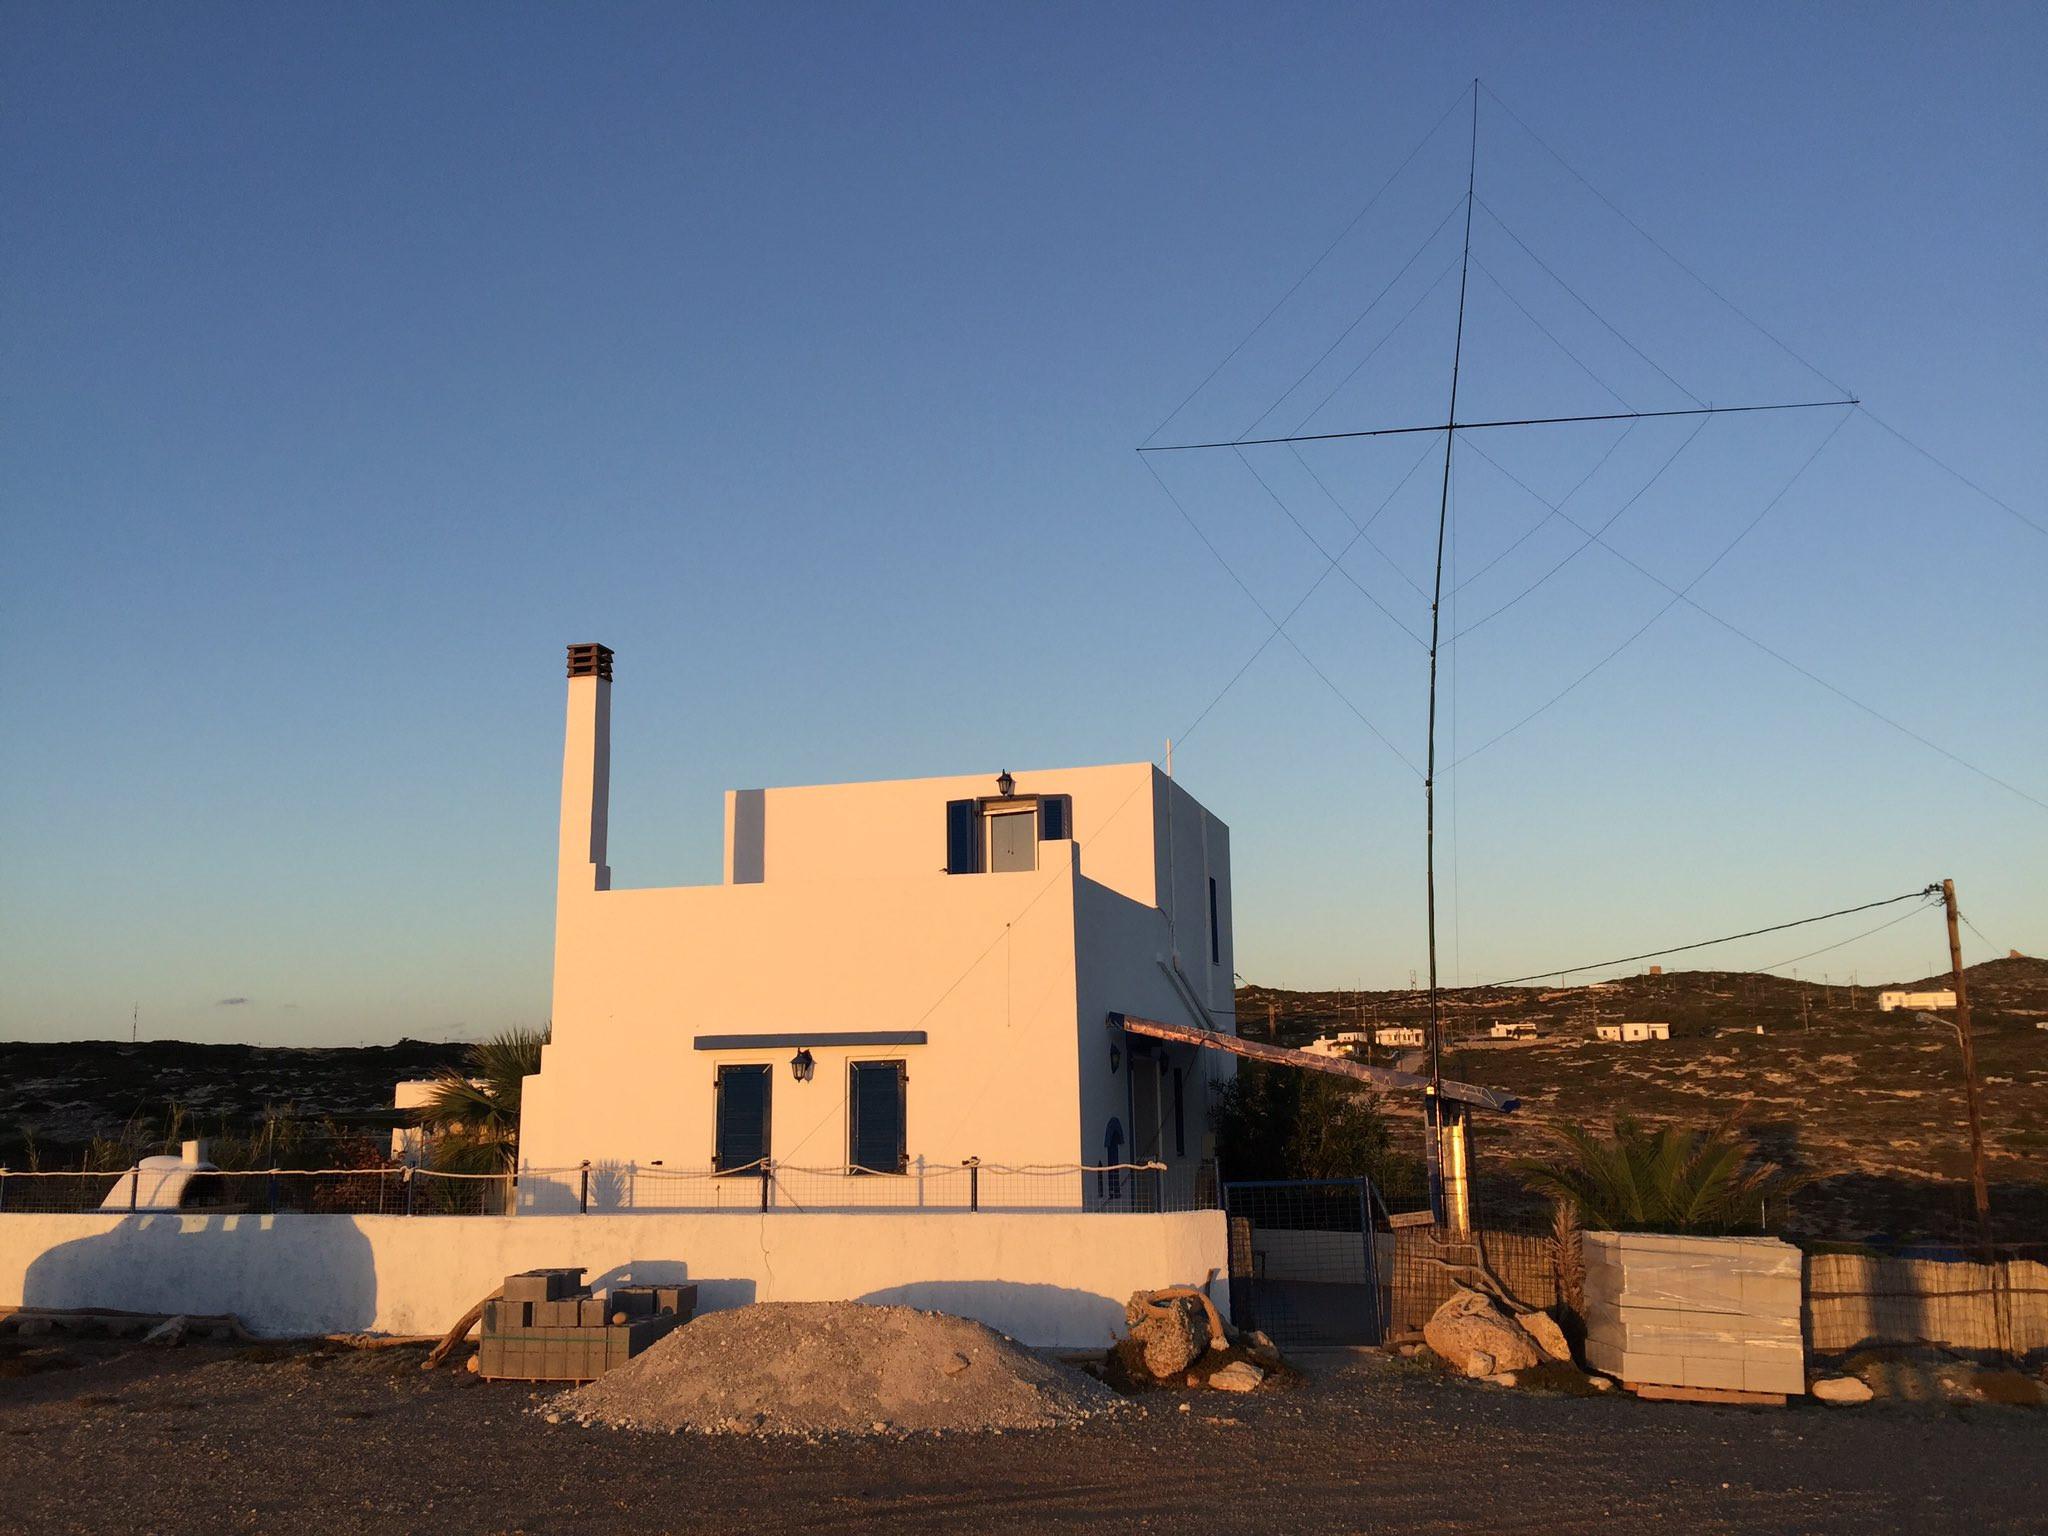 SV8/DJ4EL Antikythera Island, Image 4